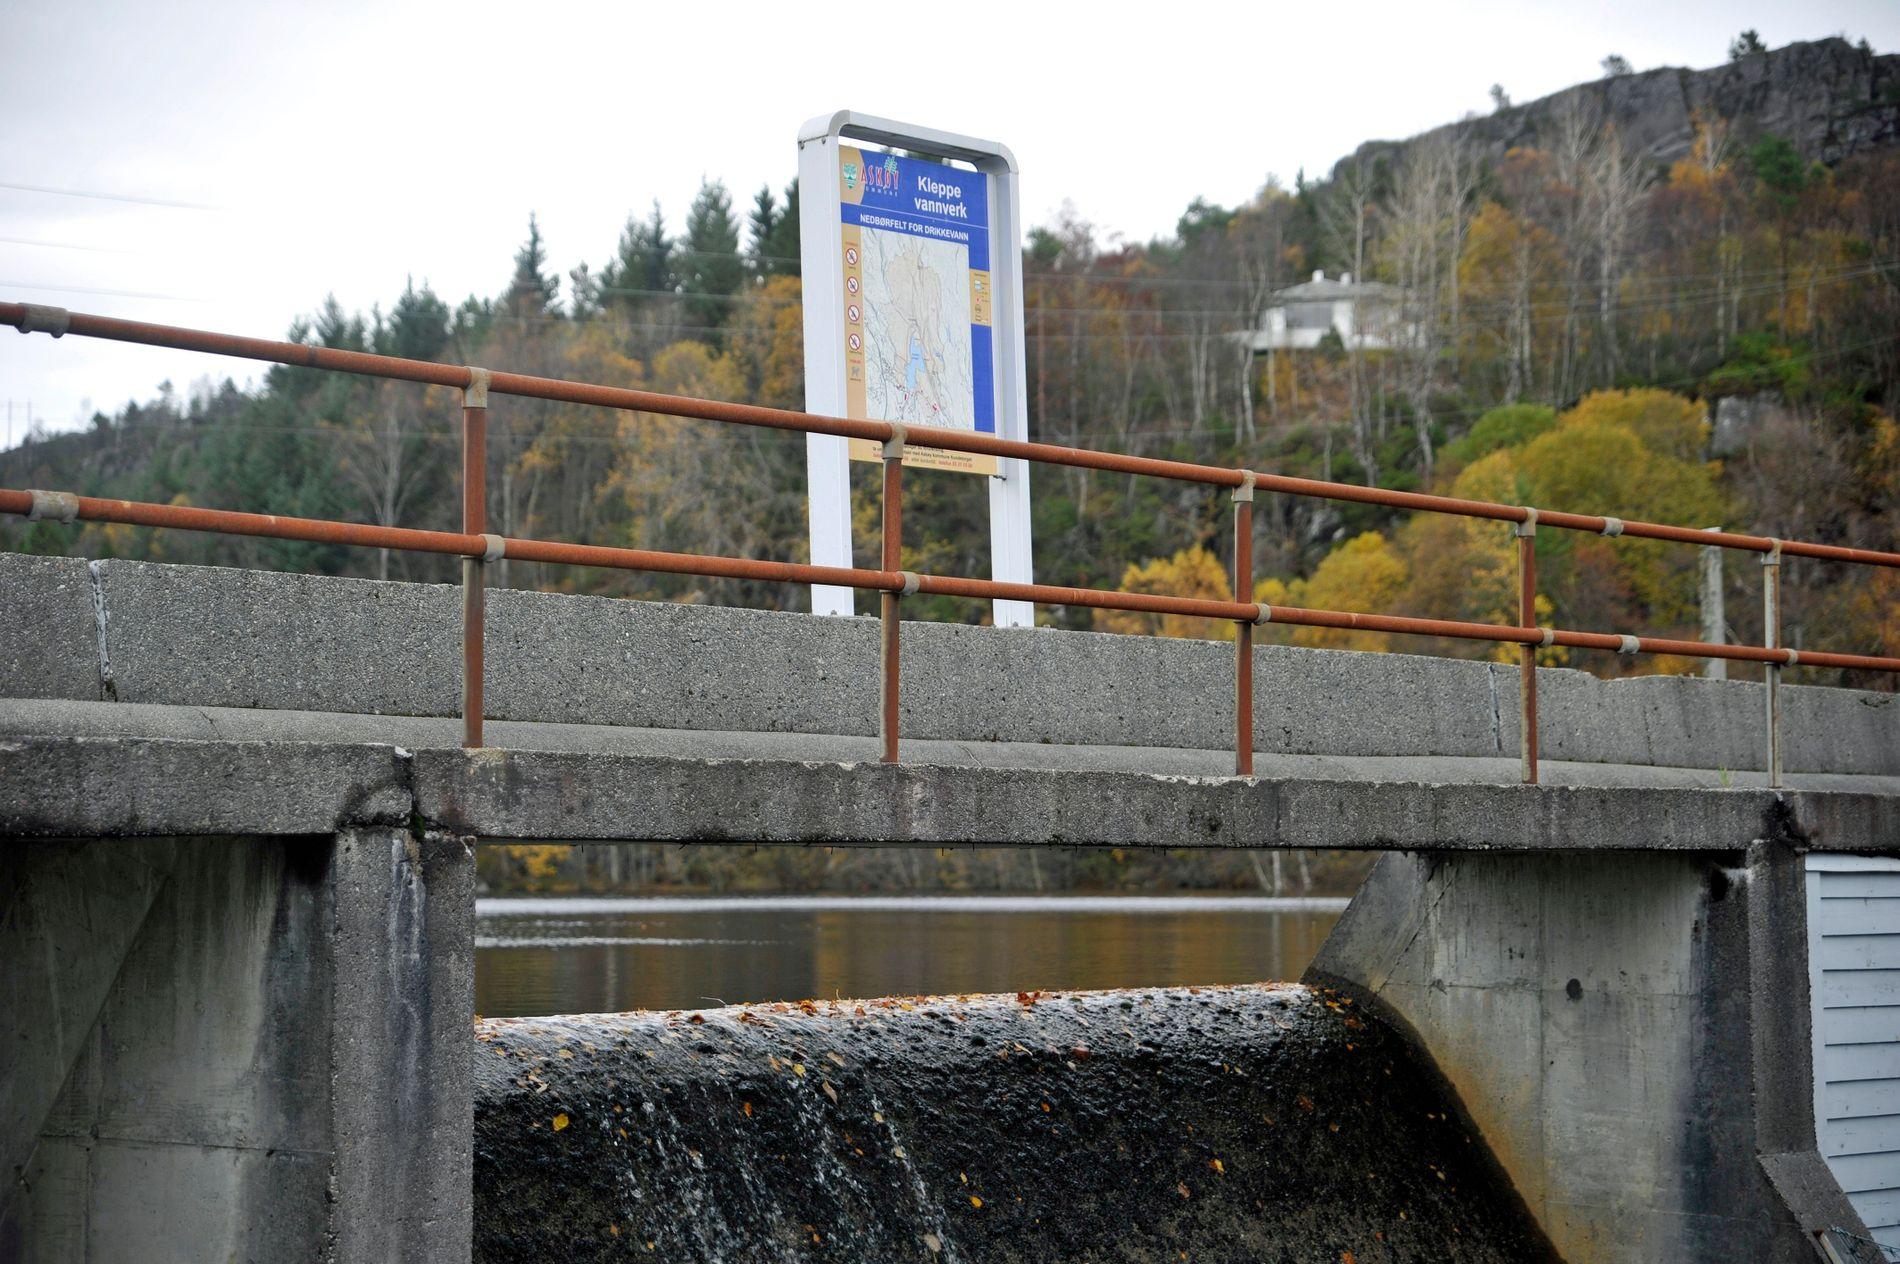 VANNVERK: Kleppe vannverk i Askøy kommune.